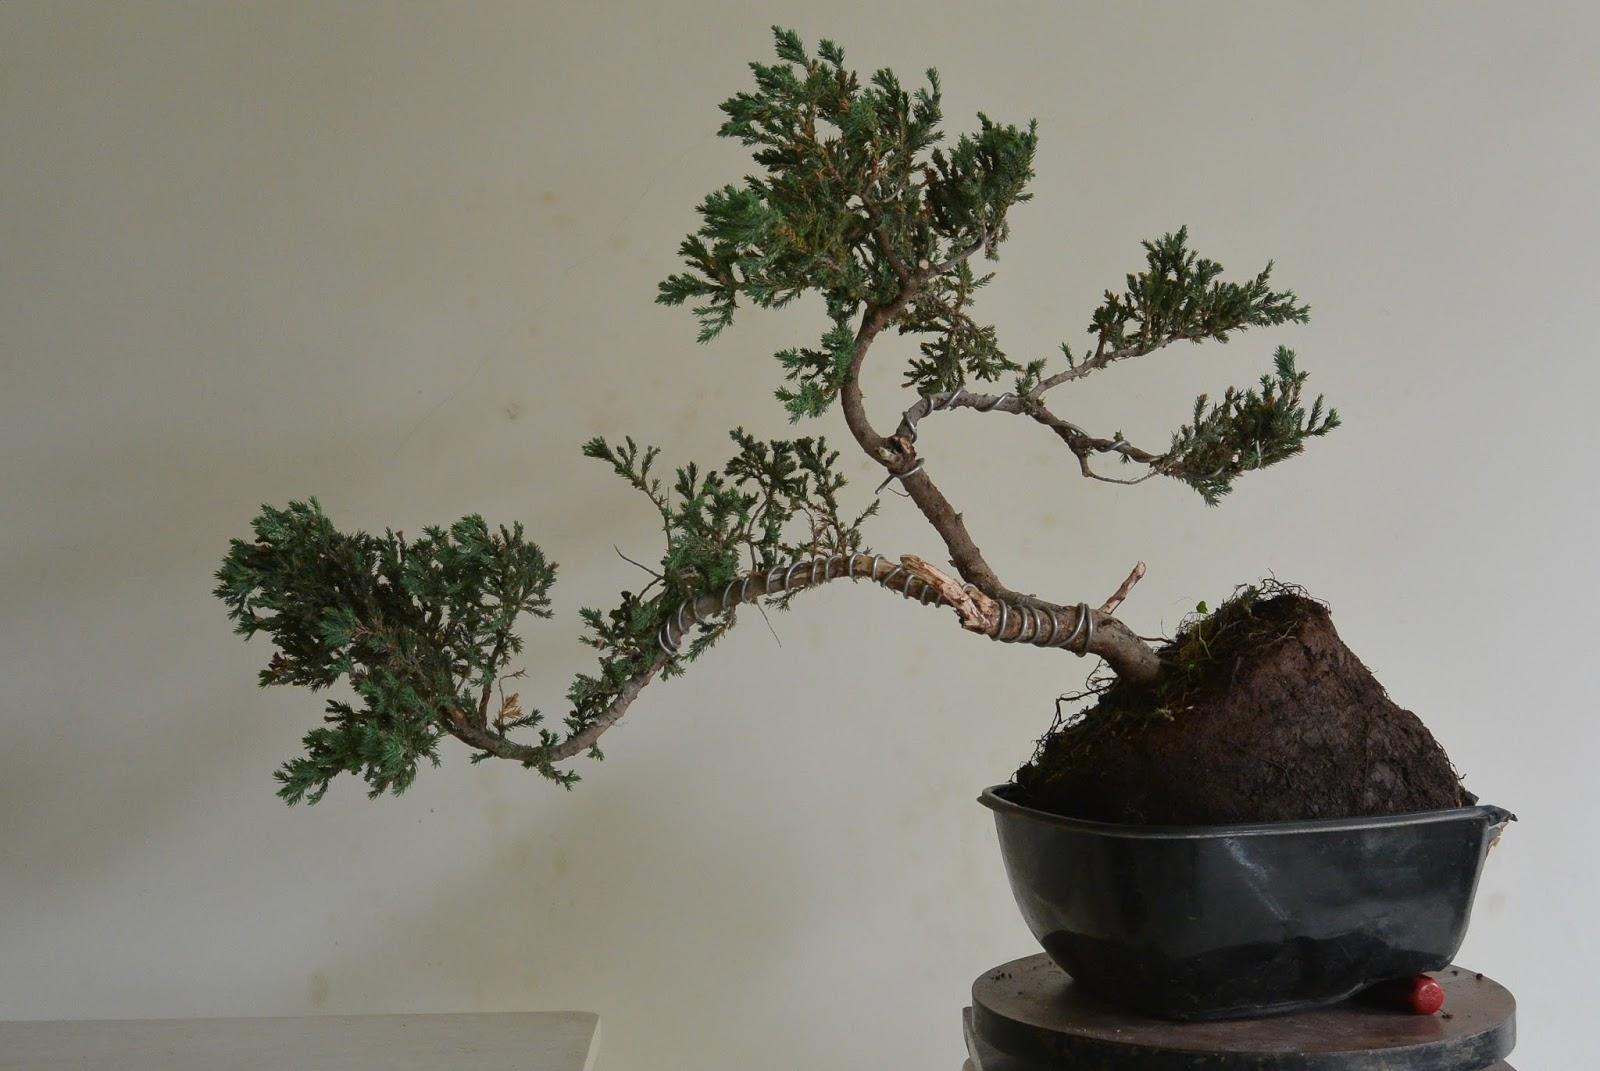 Kapilaascreations Bonsai Wiring Trunk Shaping And